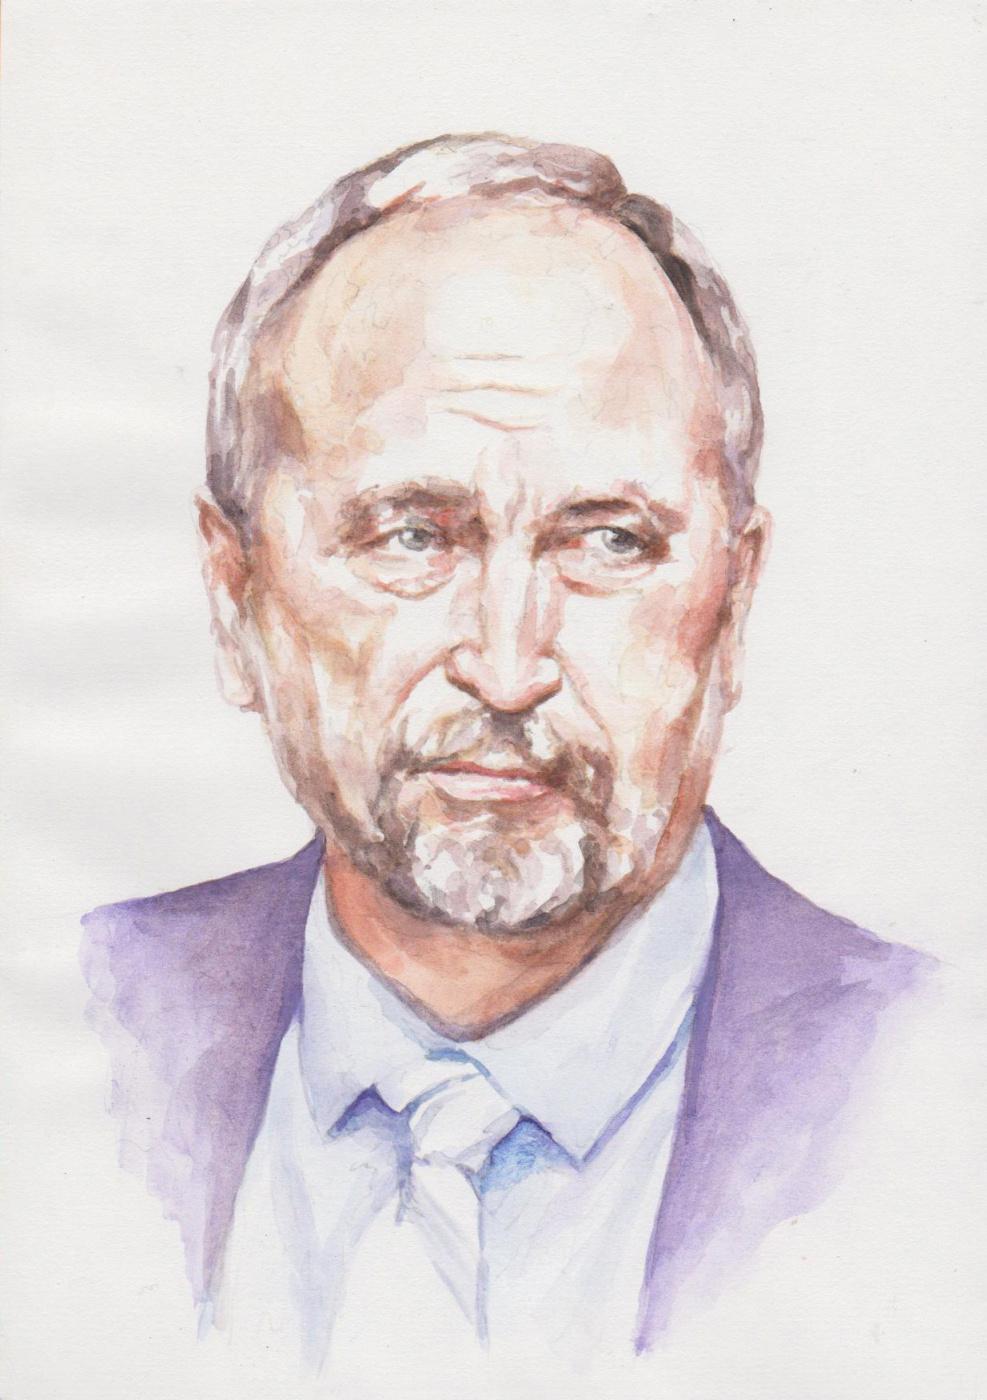 Ivan Alexandrovich Dolgorukov. Watercolor portrait of my friend (Chief Architect of the City of Barnaul) Sergey AV Bozhenko